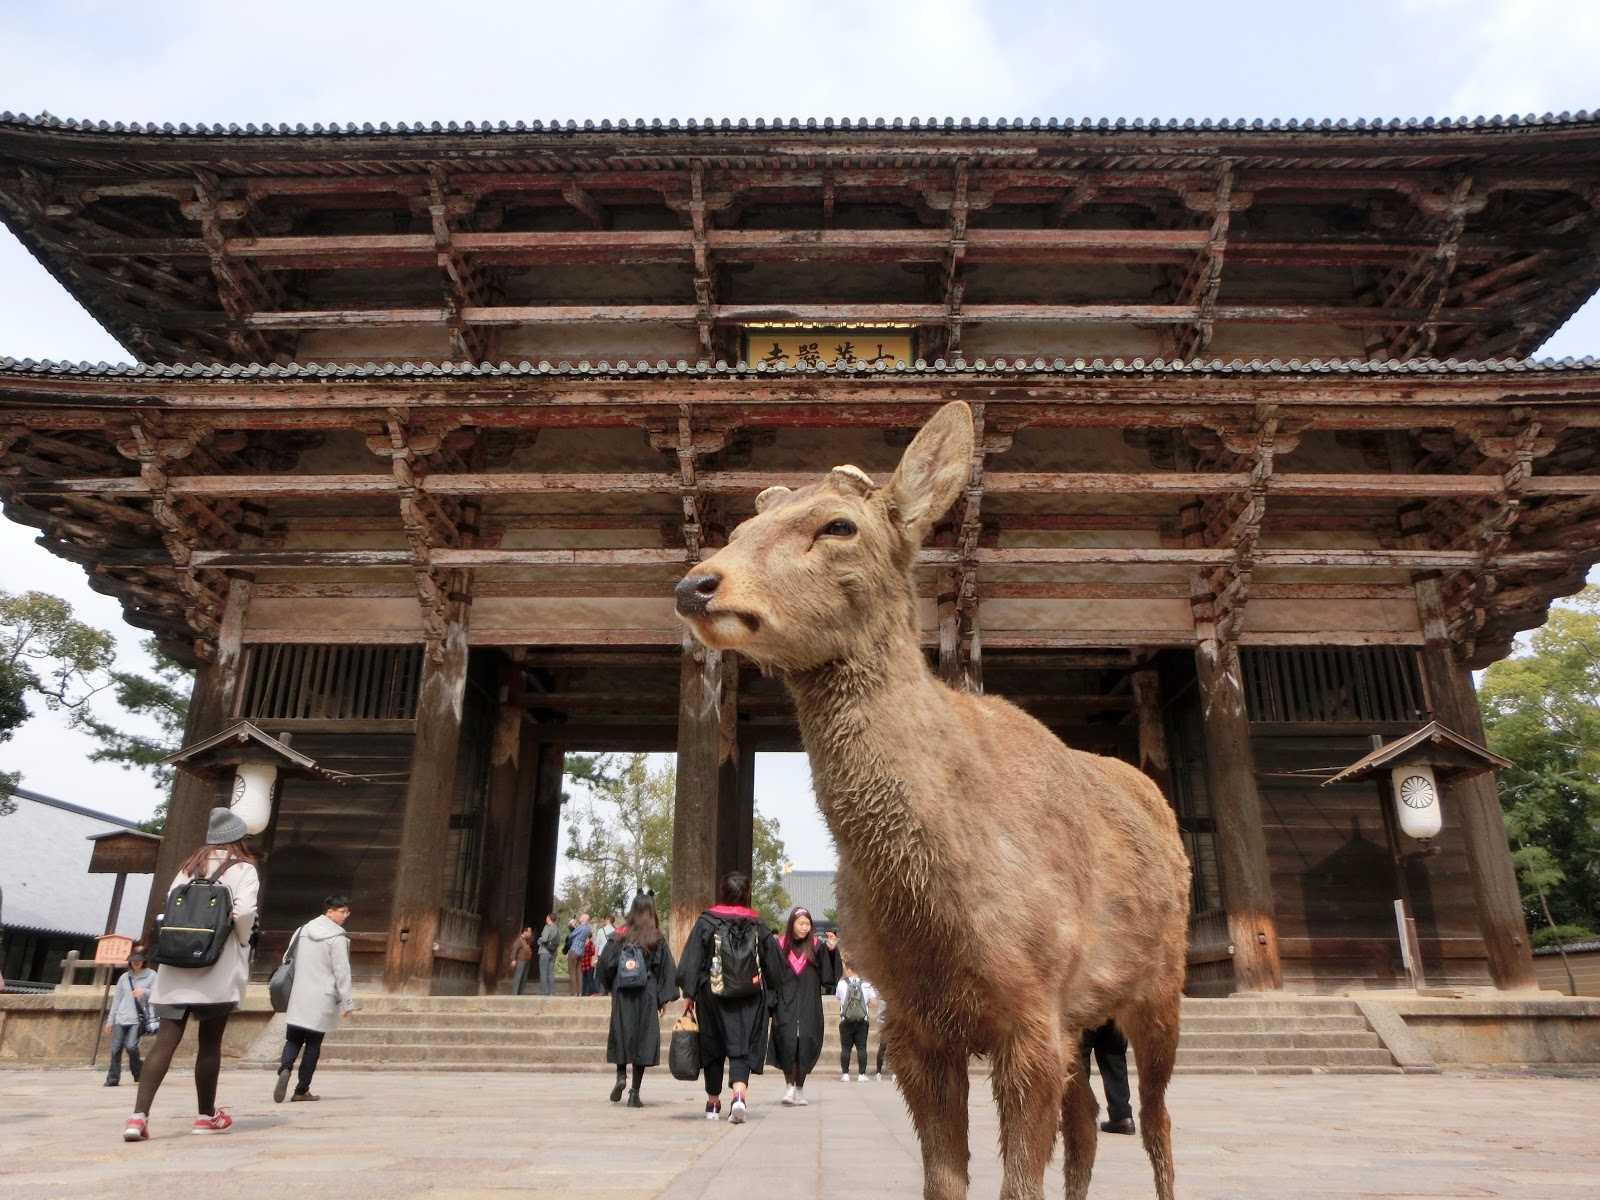 Day3:奈良→伏見稻荷大社→錦市場→鴨川 第一站:奈良 奈良距離京都大約40公里,很適合安排從京都出發的一日遊,而奈良現在最廣為人知的大概就是有親近人又貪吃的小鹿了!事實上,奈良寶貴的地方不只是這些鹿,而是奈良擁有全世界最古老的木造建築群,包含了東大寺、春日大社等,所以來到奈良別只是走馬看花,停下腳步好好欣賞這些建築物吧!  ▶︎建議停留時間:3.5小時 ▶︎ 京都→奈良:從京都車站坐JR